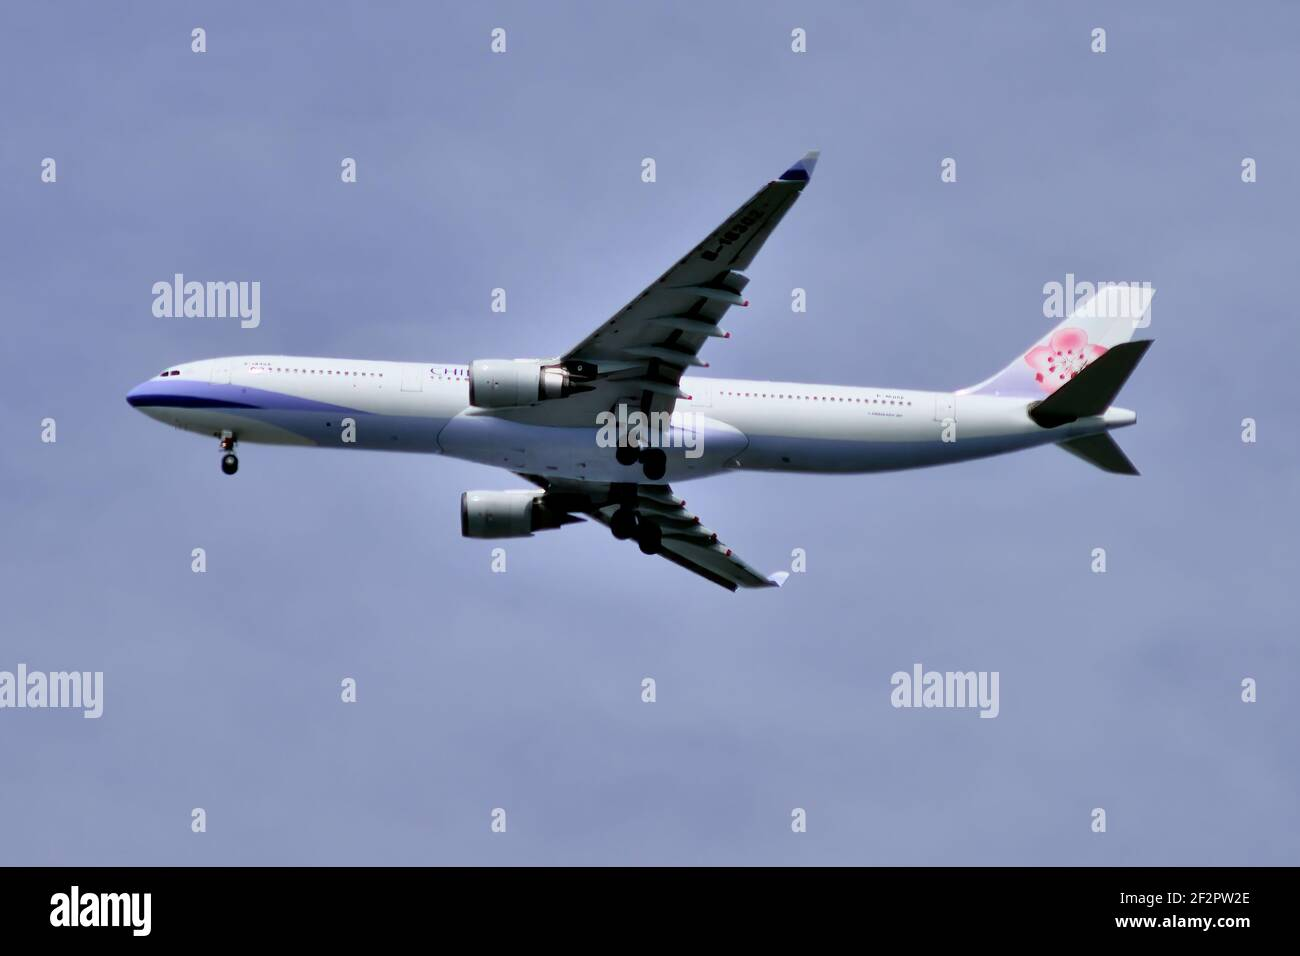 China Airlines, Taiwan, Airbus, A330-300, B-18302, Final approach, Landing, Tokyo Haneda Airport, Tokyo, Japan Stock Photo